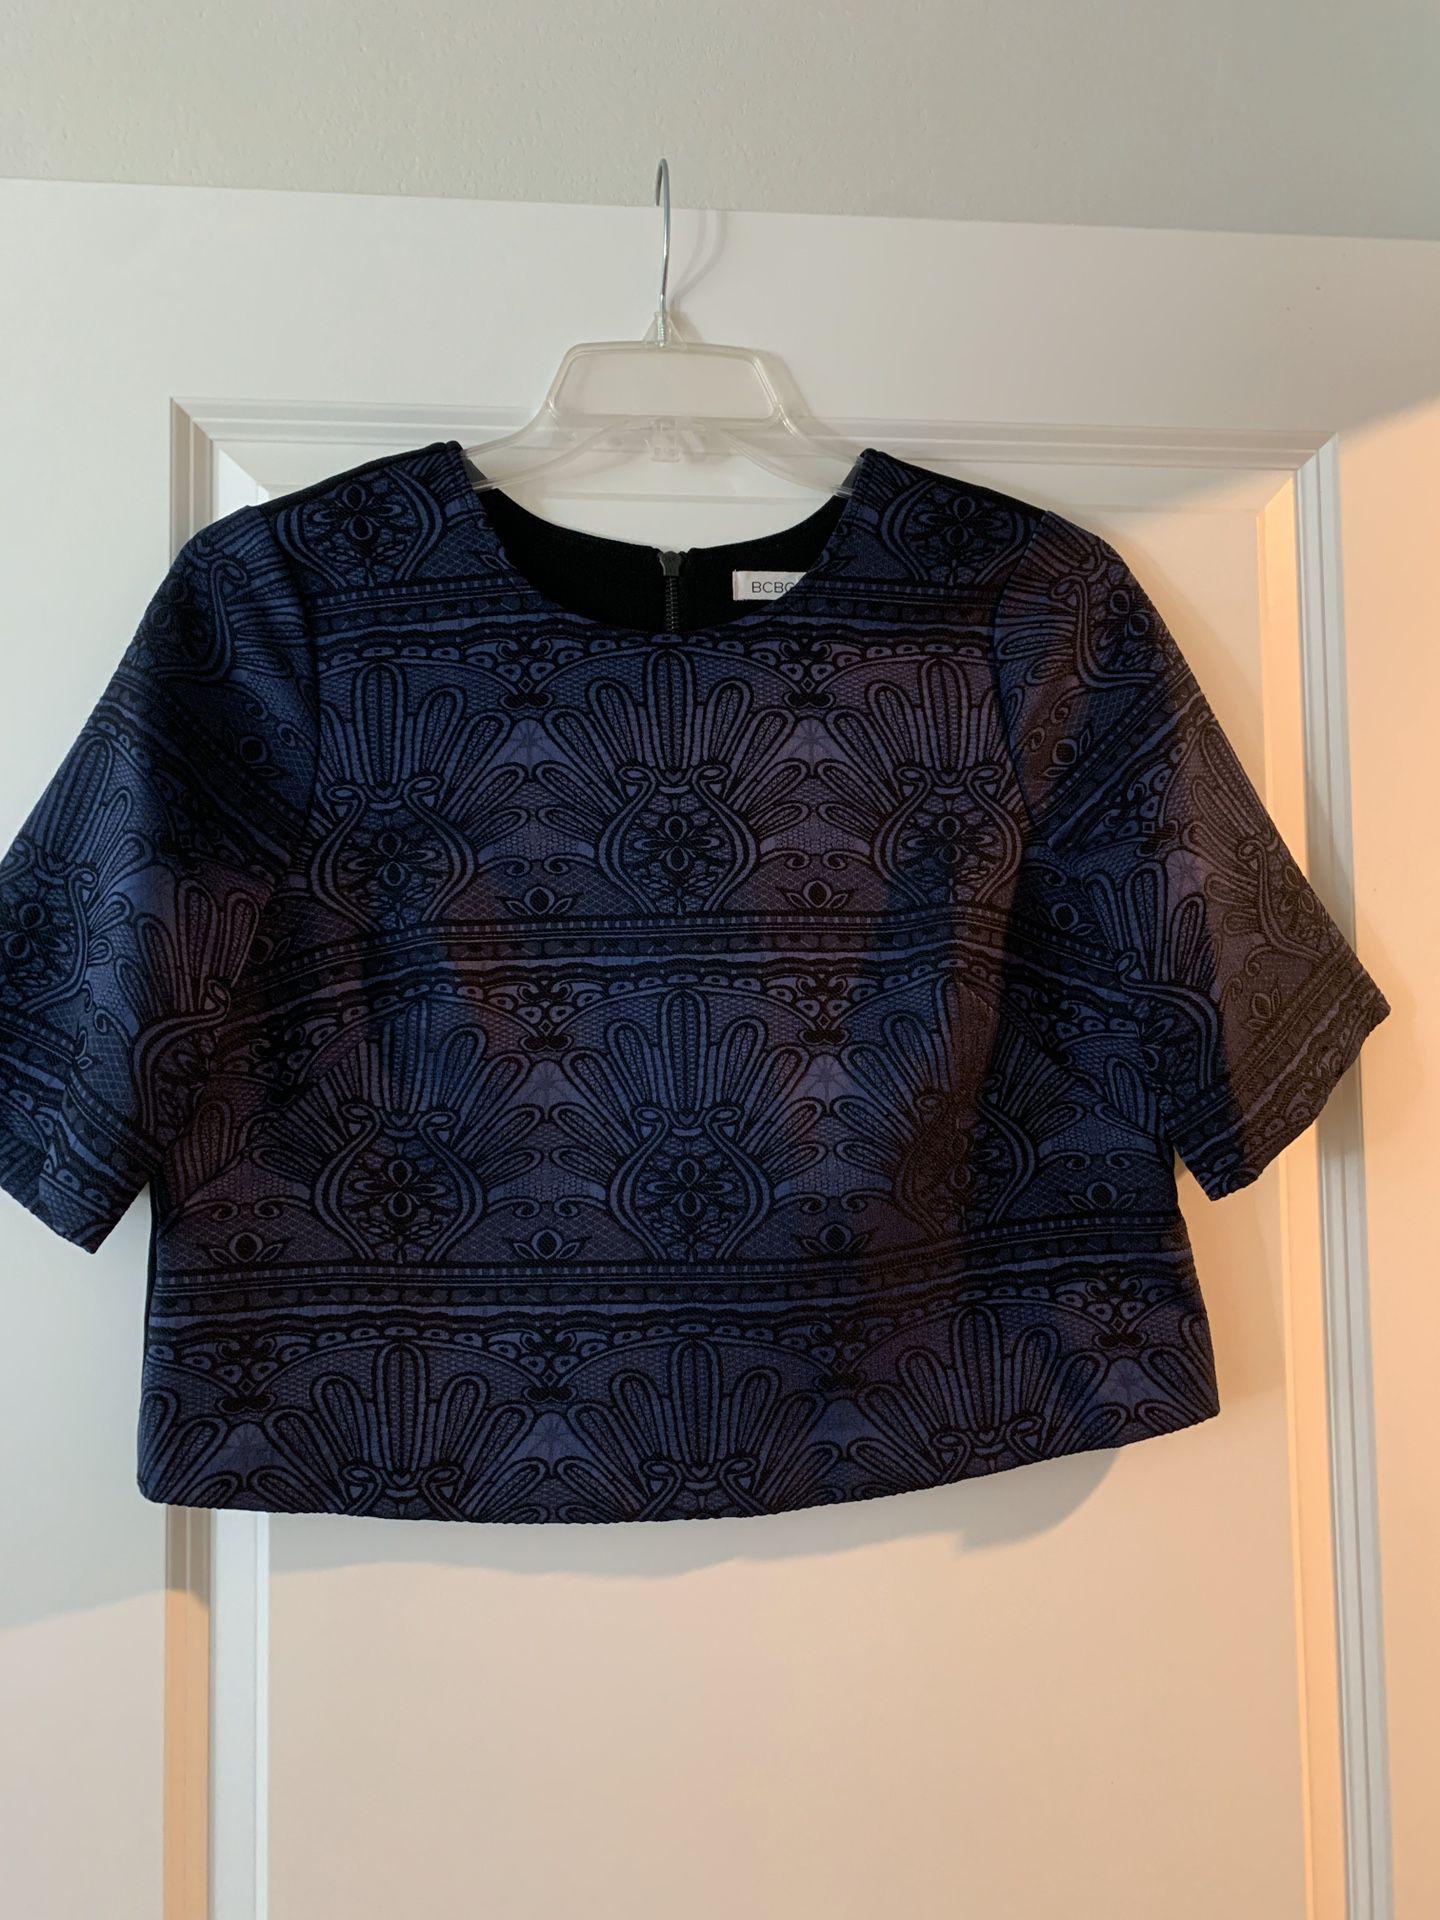 Bcbg fancy shirts